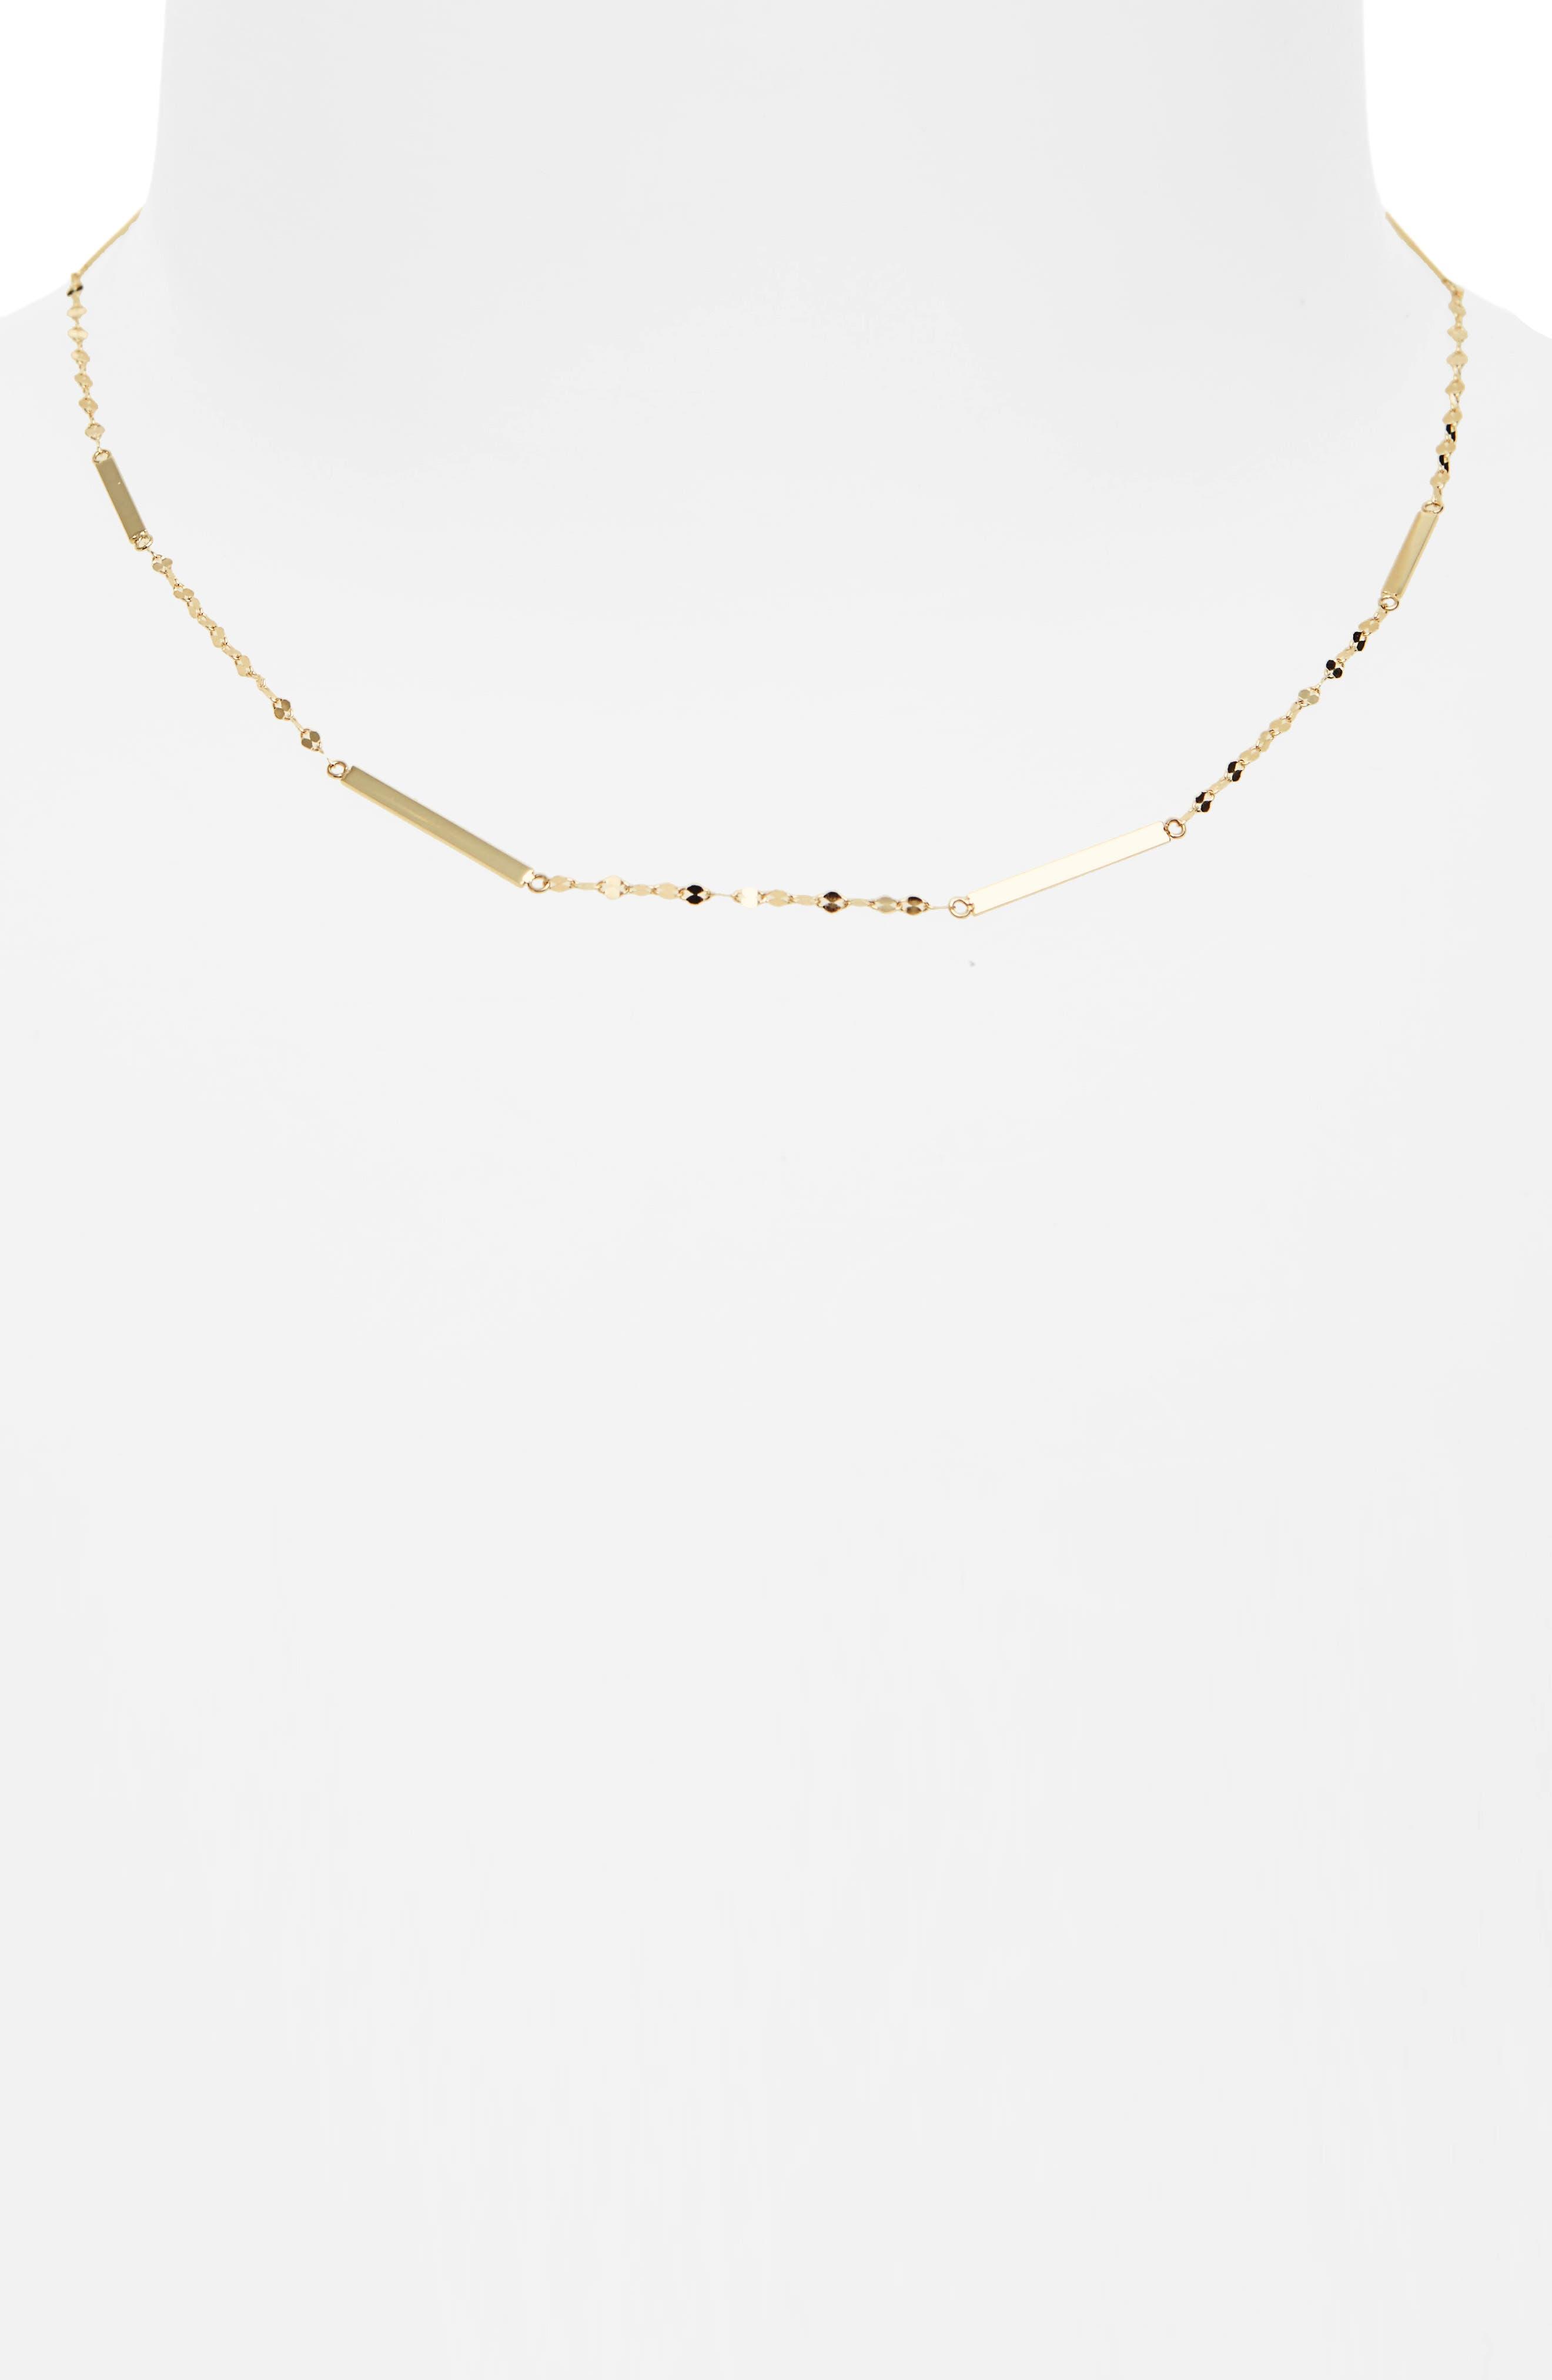 Alternate Image 1 Selected - Lana Jewelry Short Bar Station Necklace